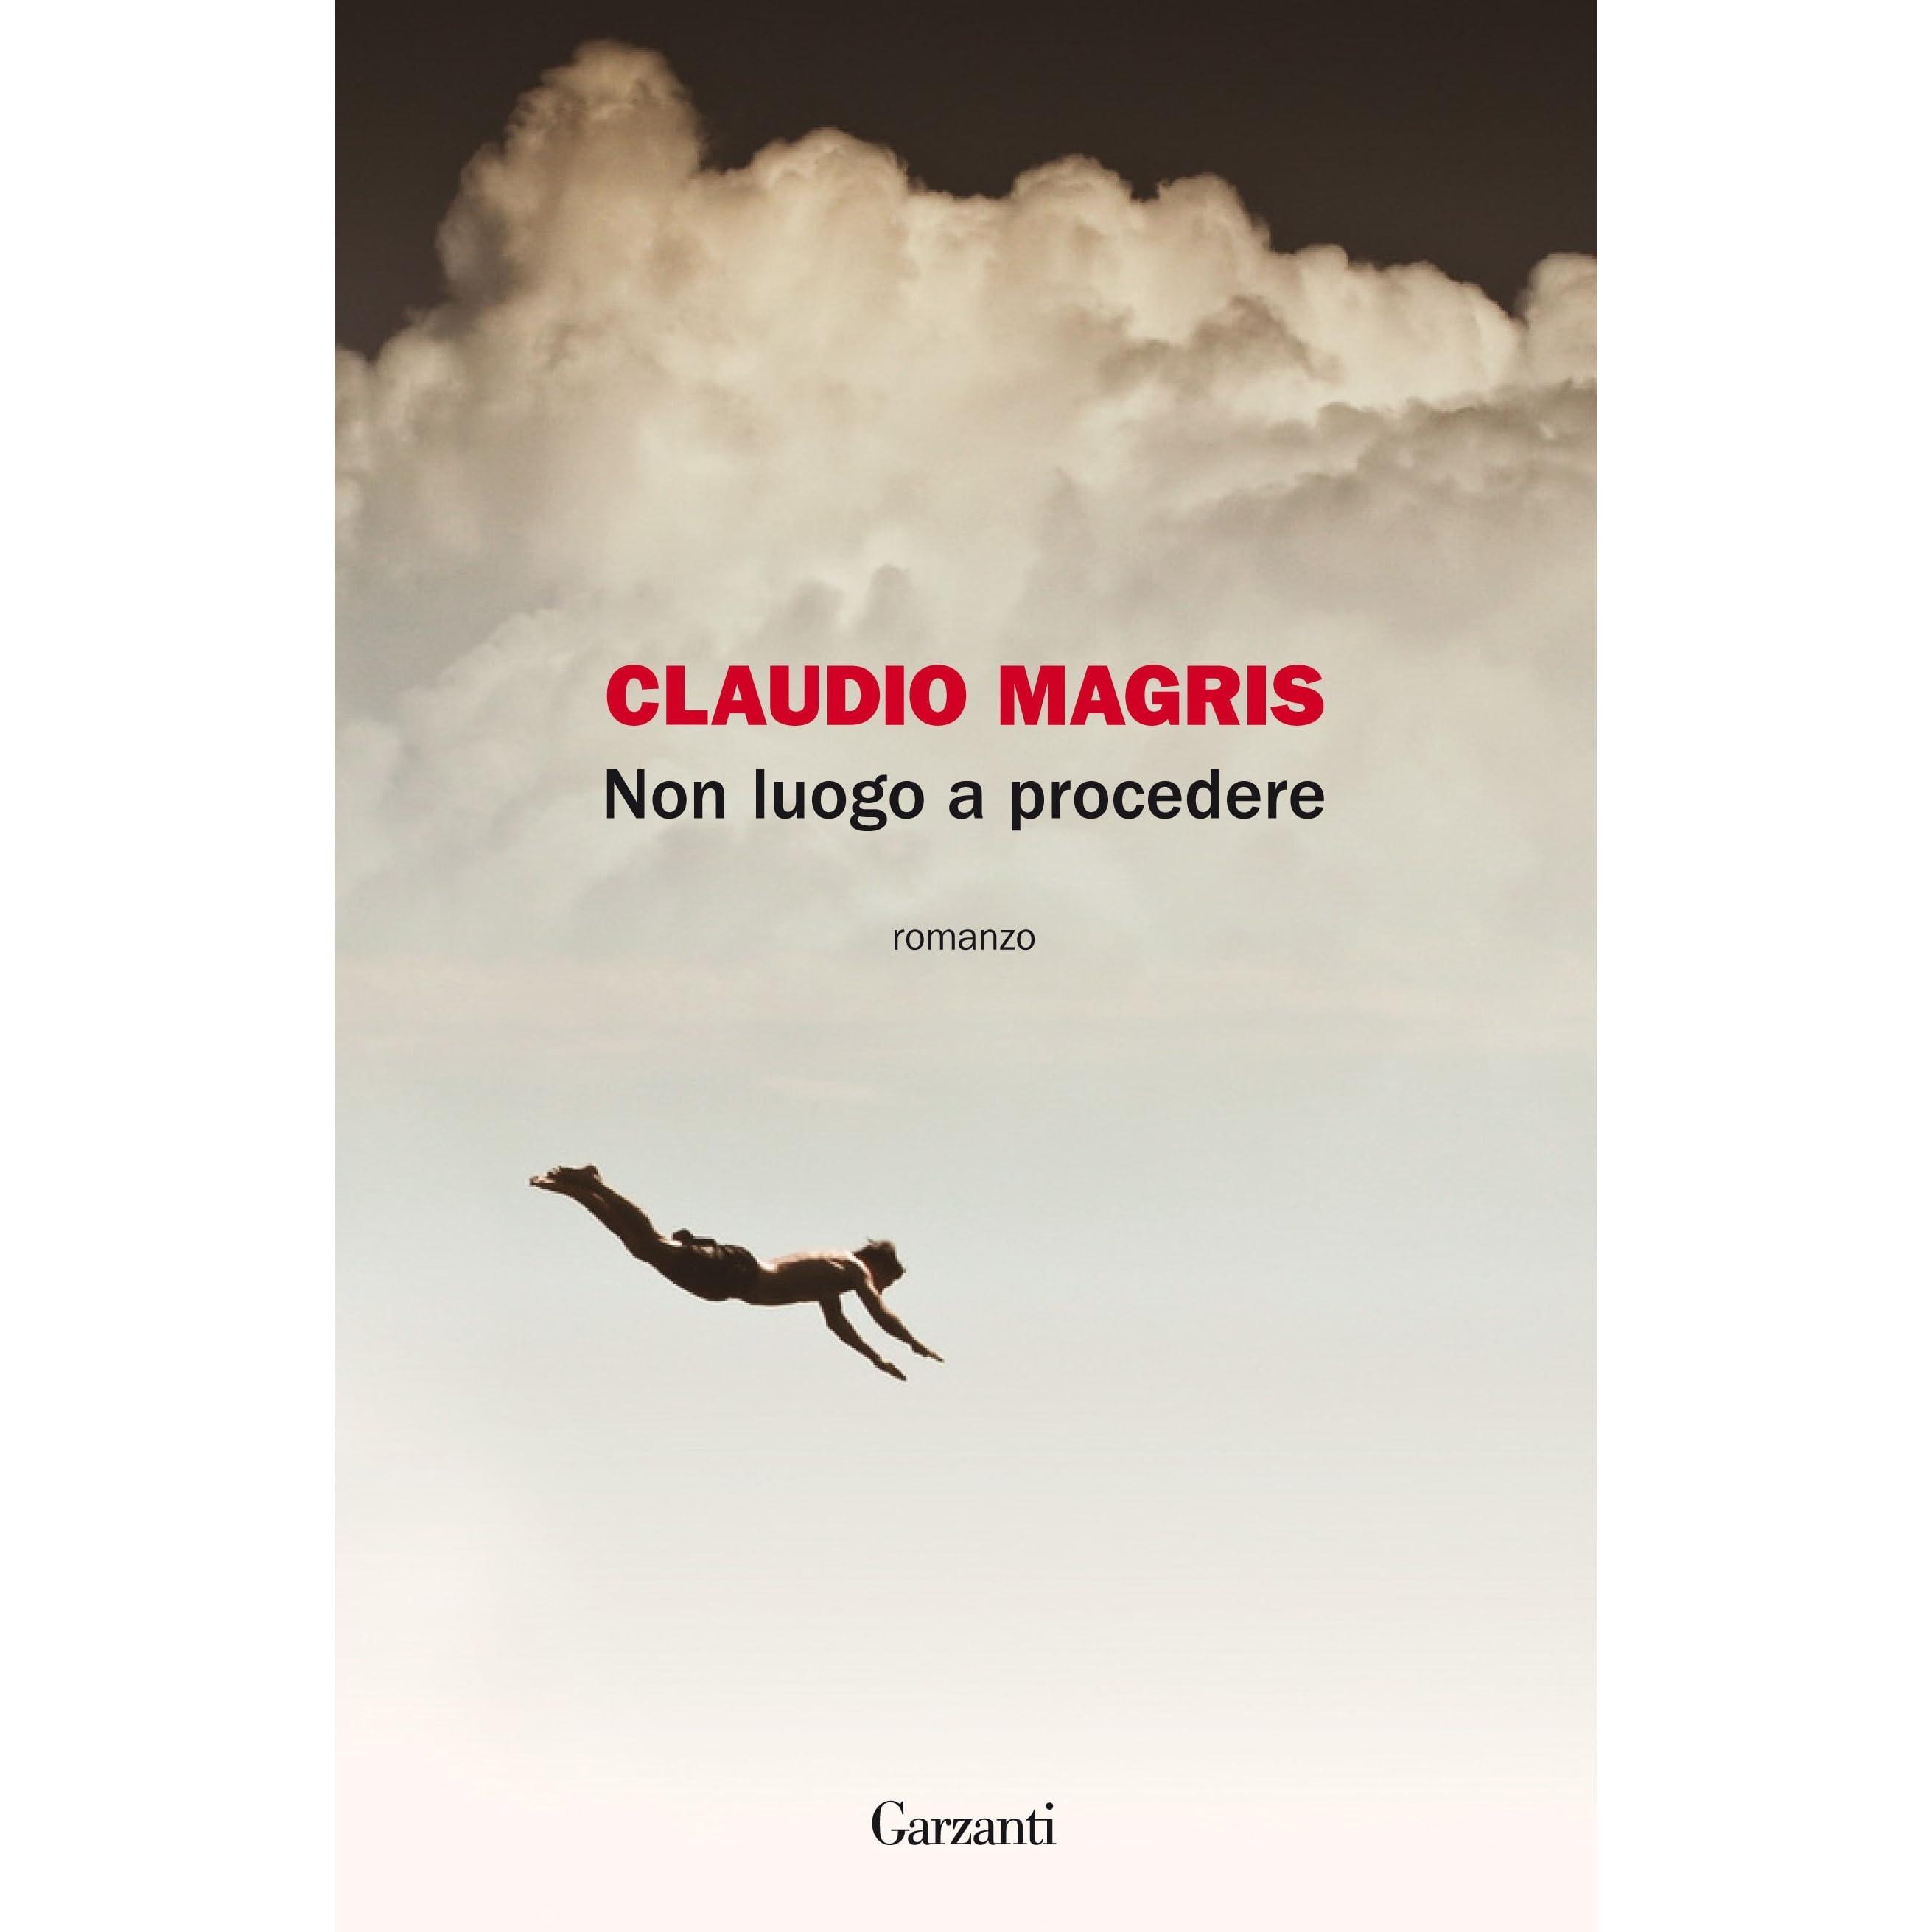 claudio margis essay Daniel balderston, amy k kaminsky, argentina: stories for a nation aleichem, isaac bashevis singer, claudio magris  travel essays by count.